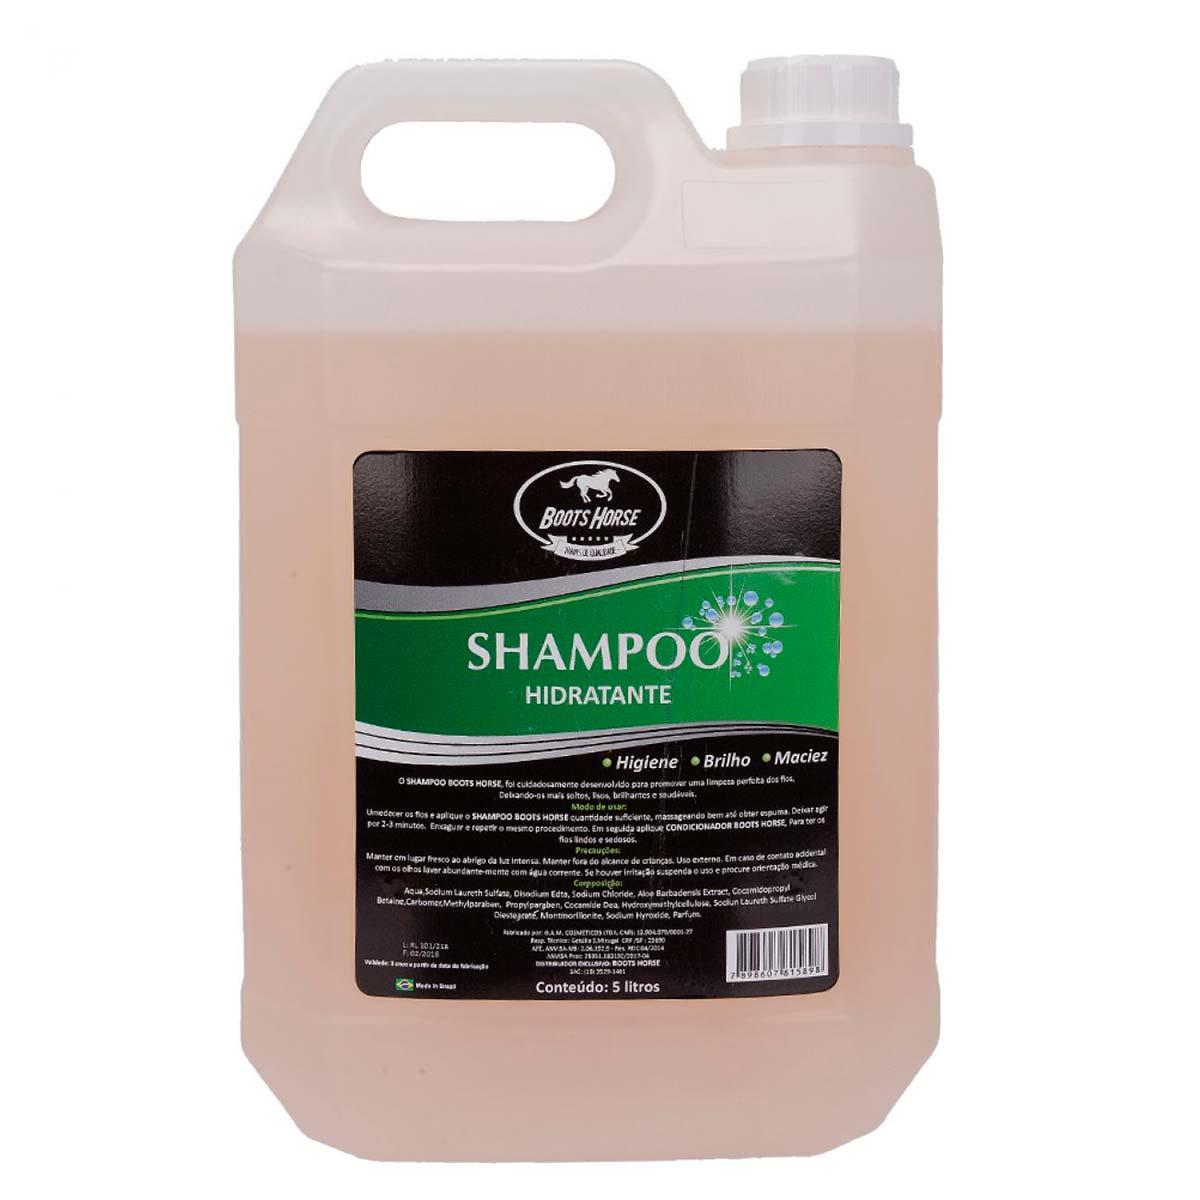 Shampoo Hidratante Boots Horse Para Crina De Cavalo 5 L